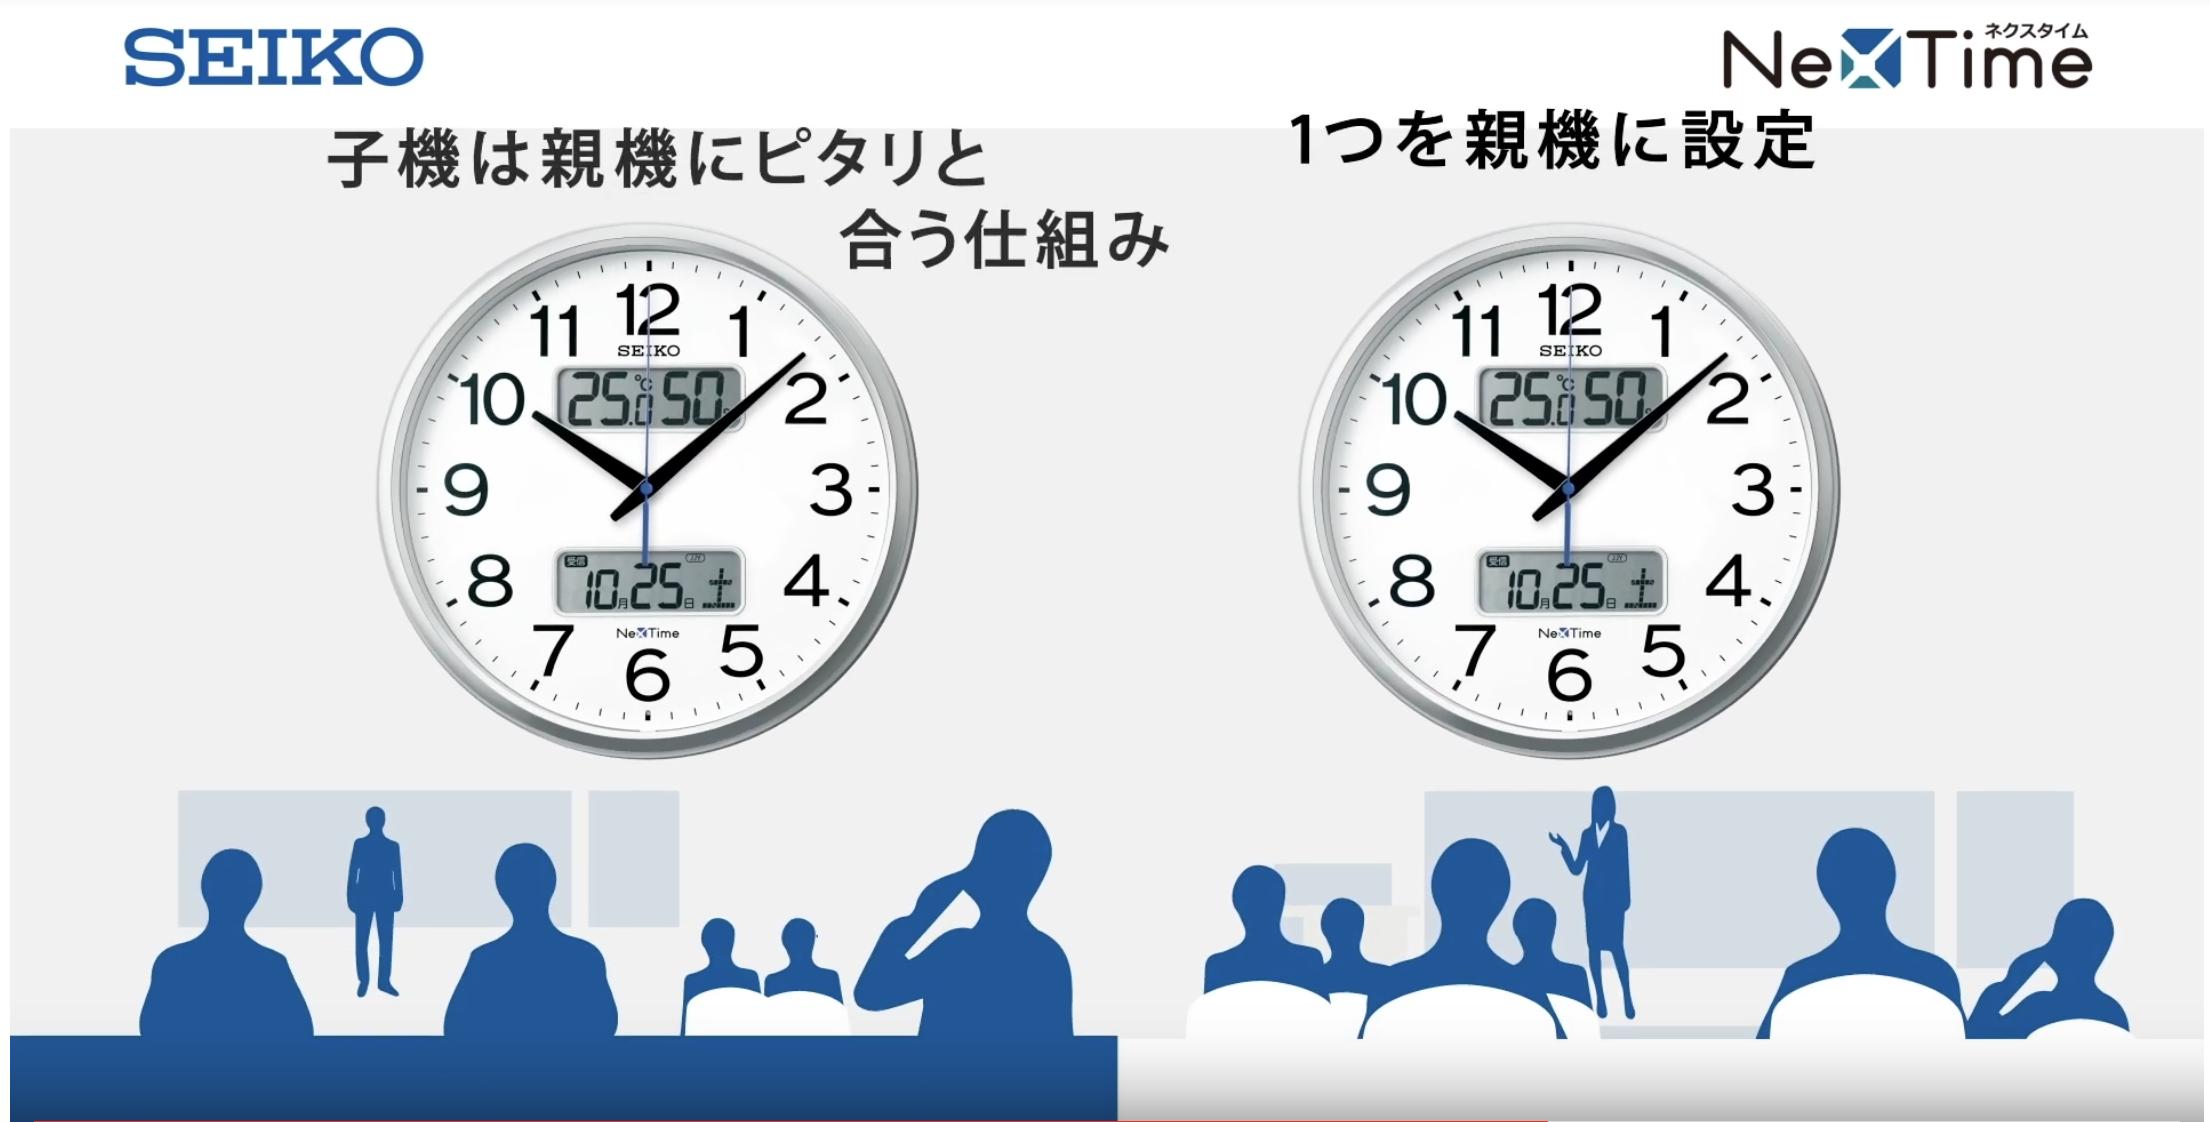 "SEIKO NexTime(ネクスタイム) 電波とスマホで "" 時刻ぴったり """